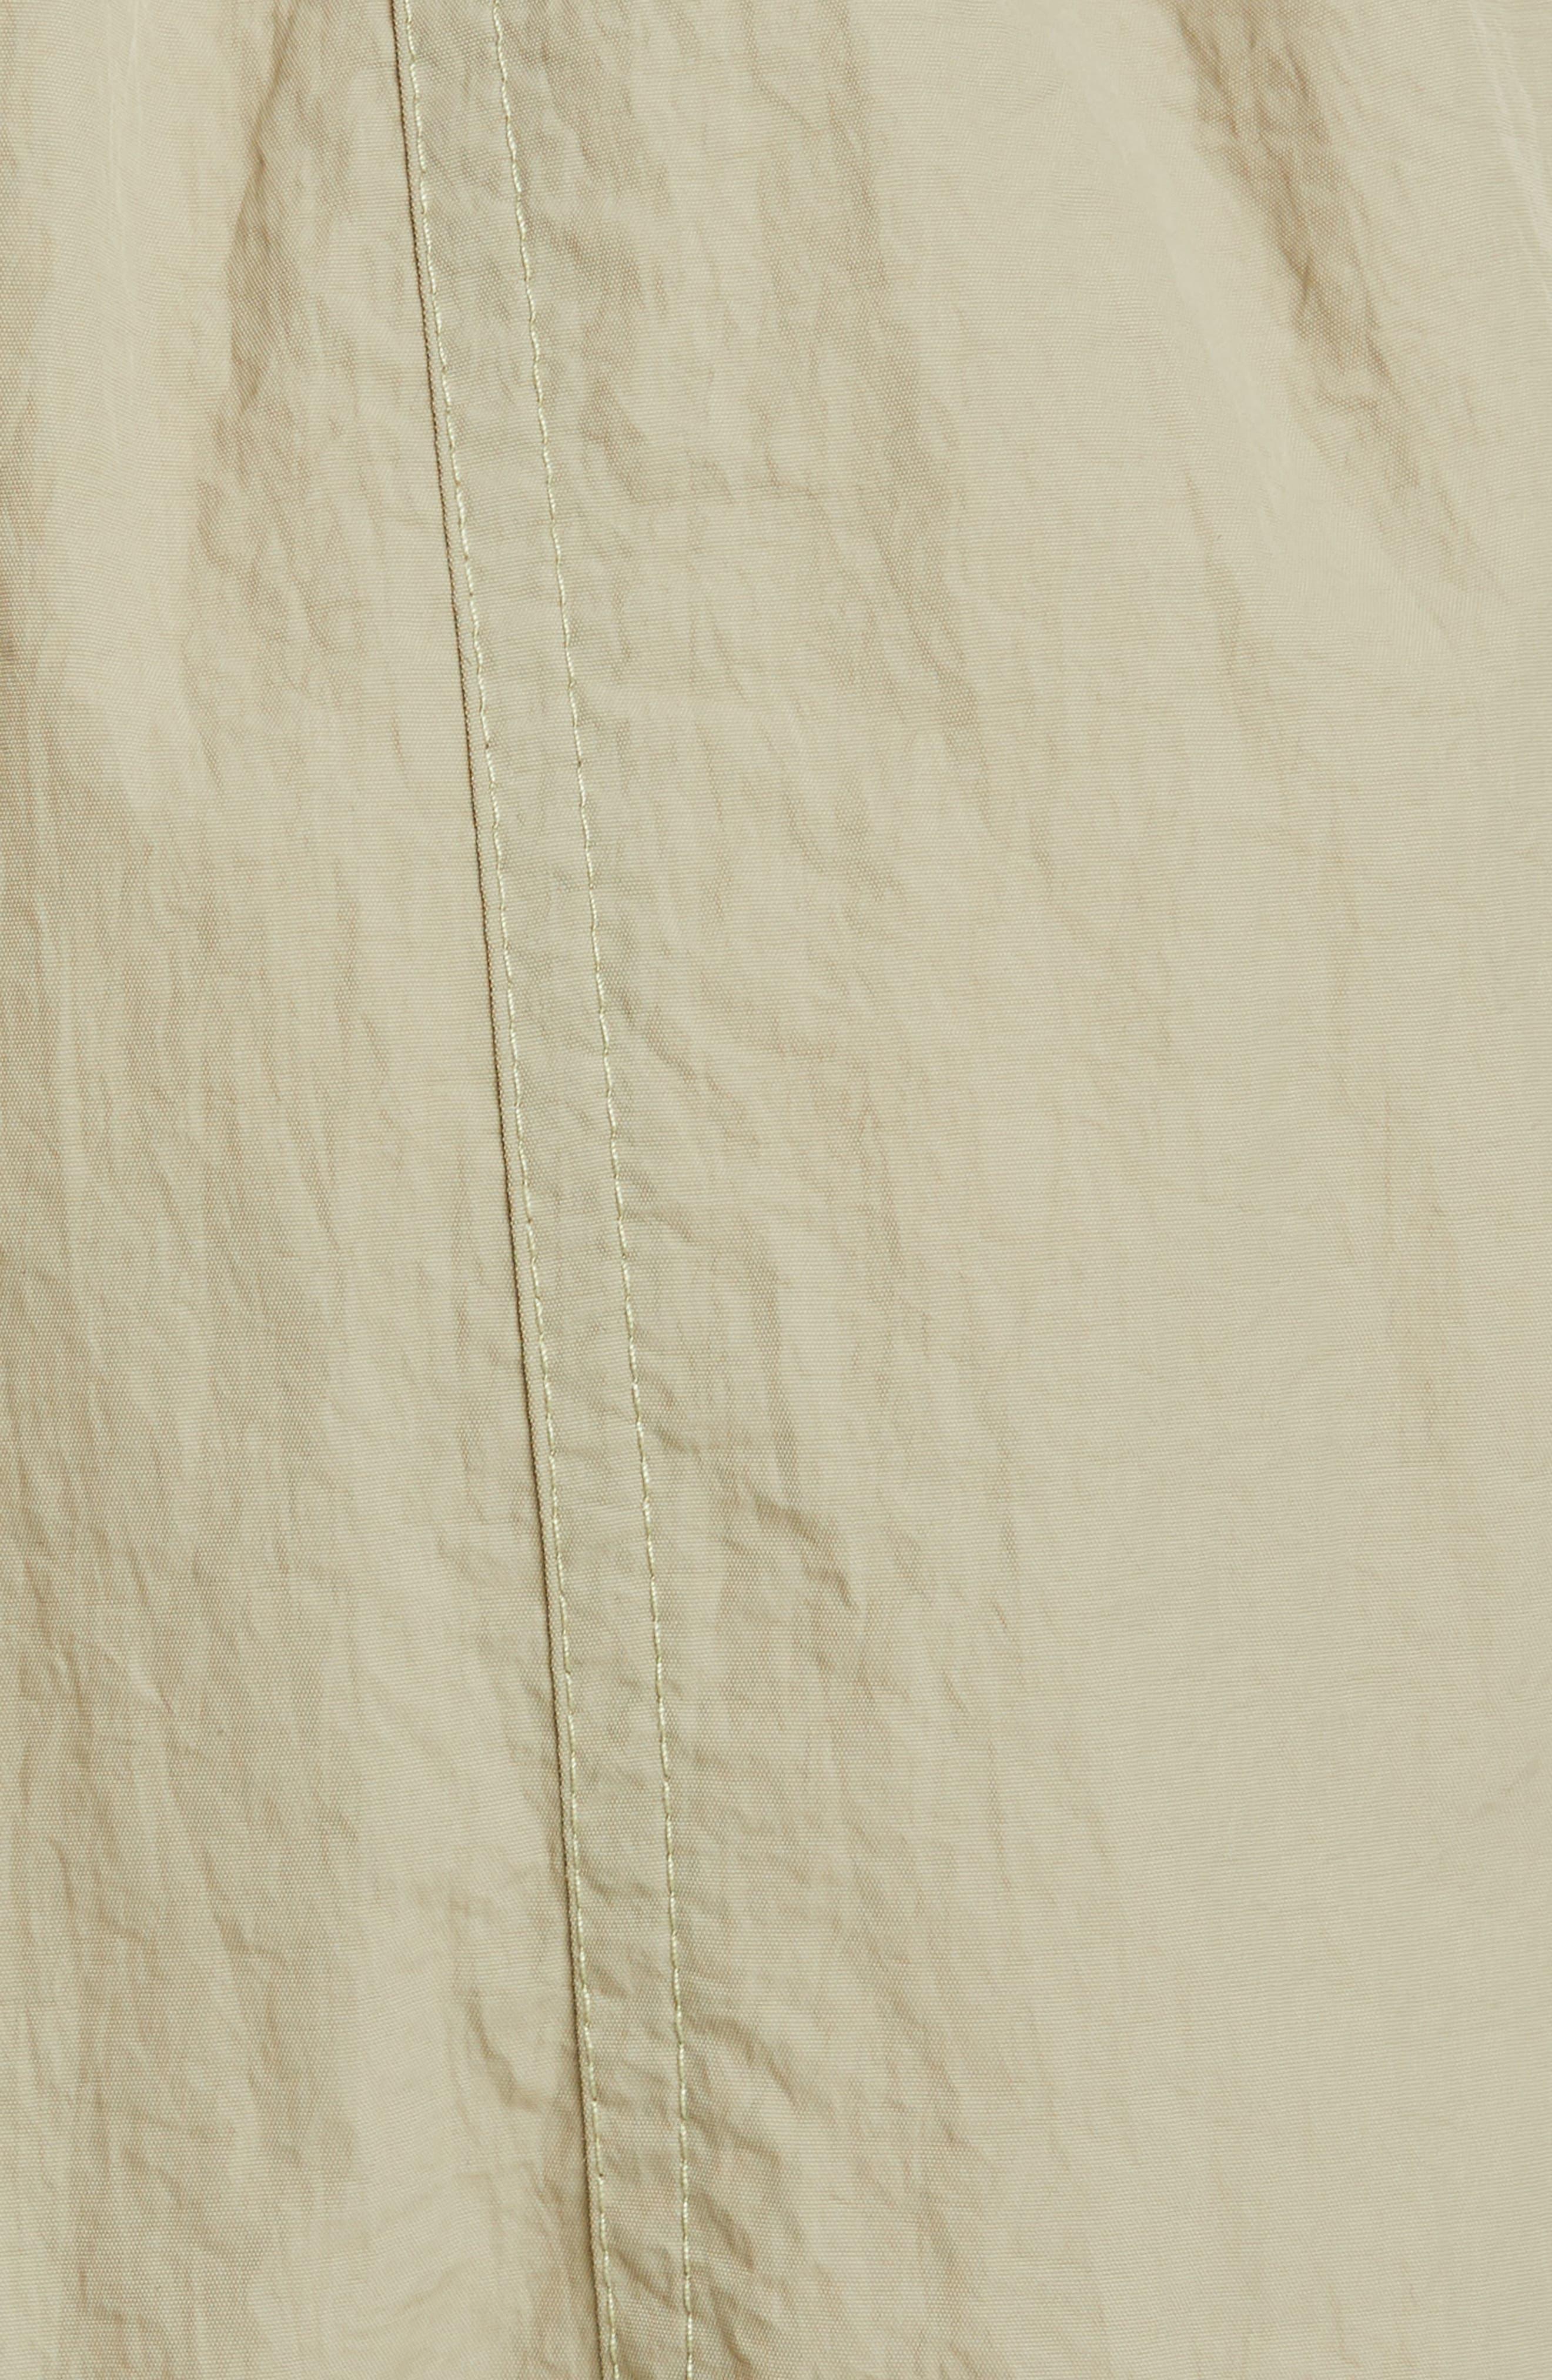 PROENZA SCHOULER, PSWL Drawstring Waist Parachute Shorts, Alternate thumbnail 5, color, MOSS